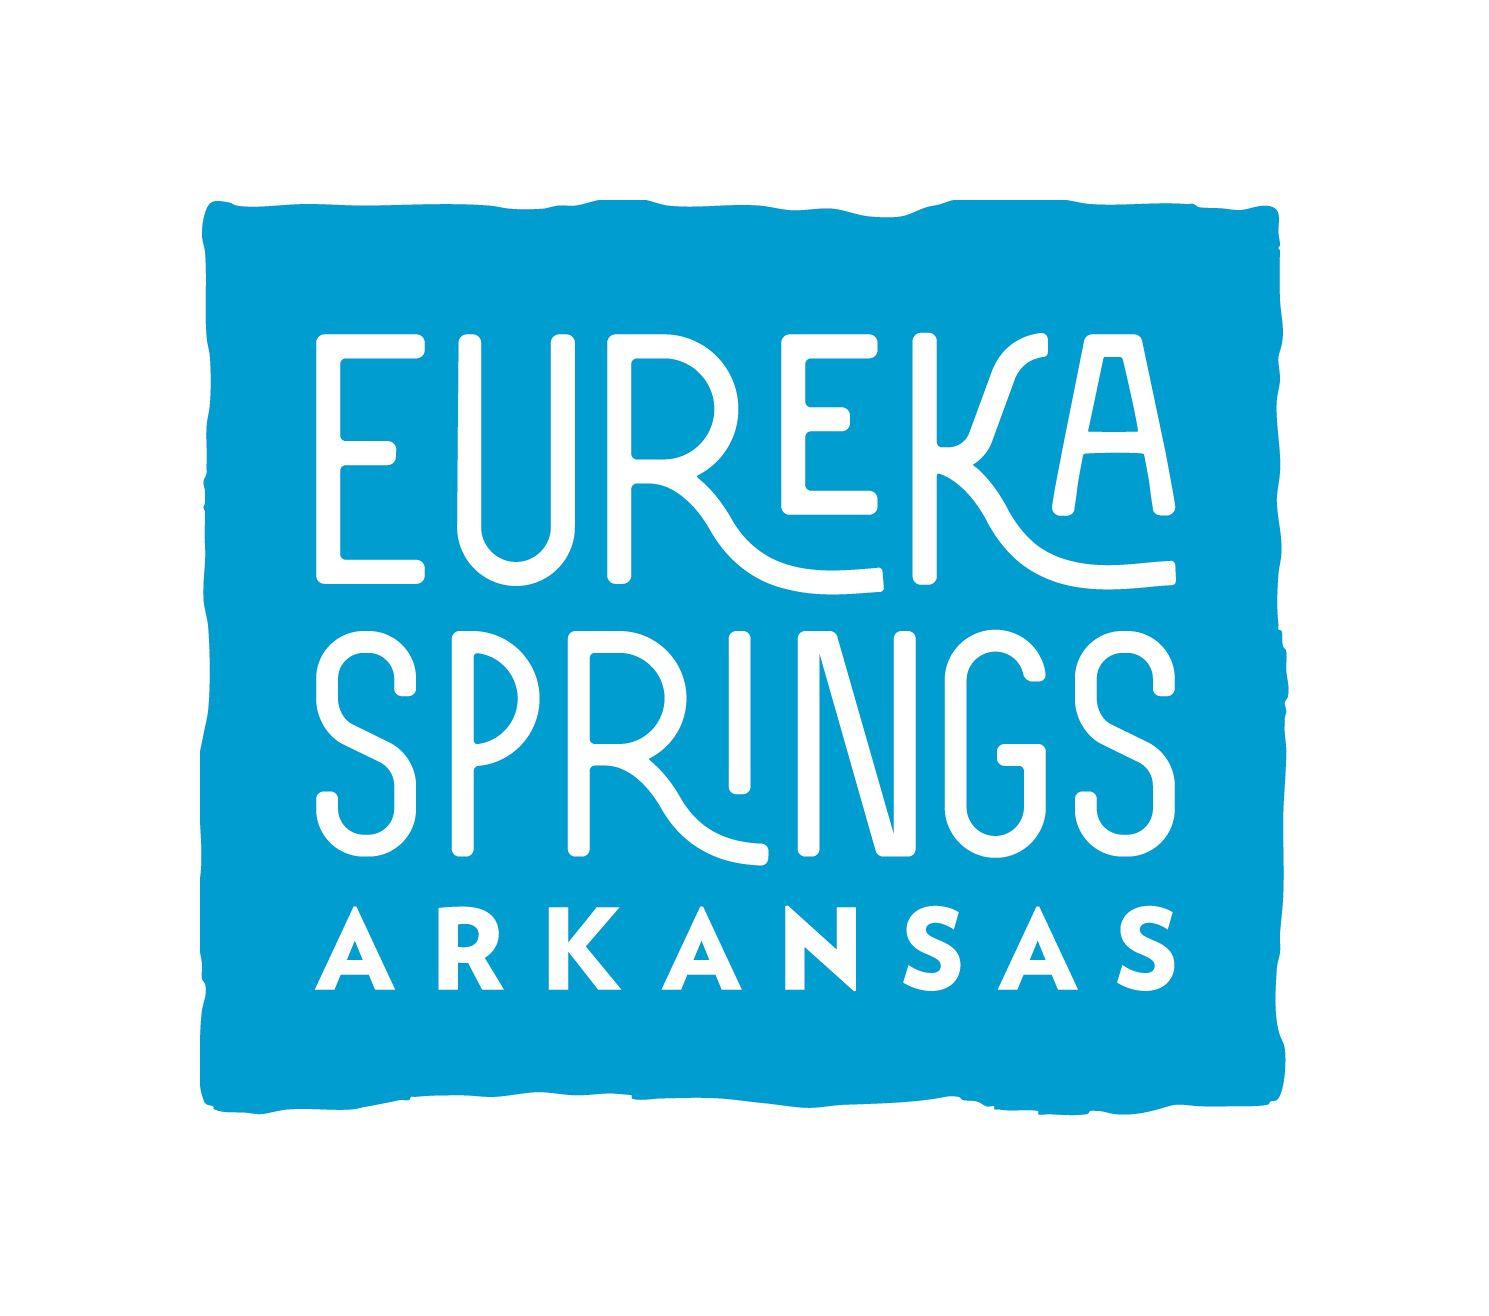 Eureka springs arkansas curious indeed in 2020 eureka